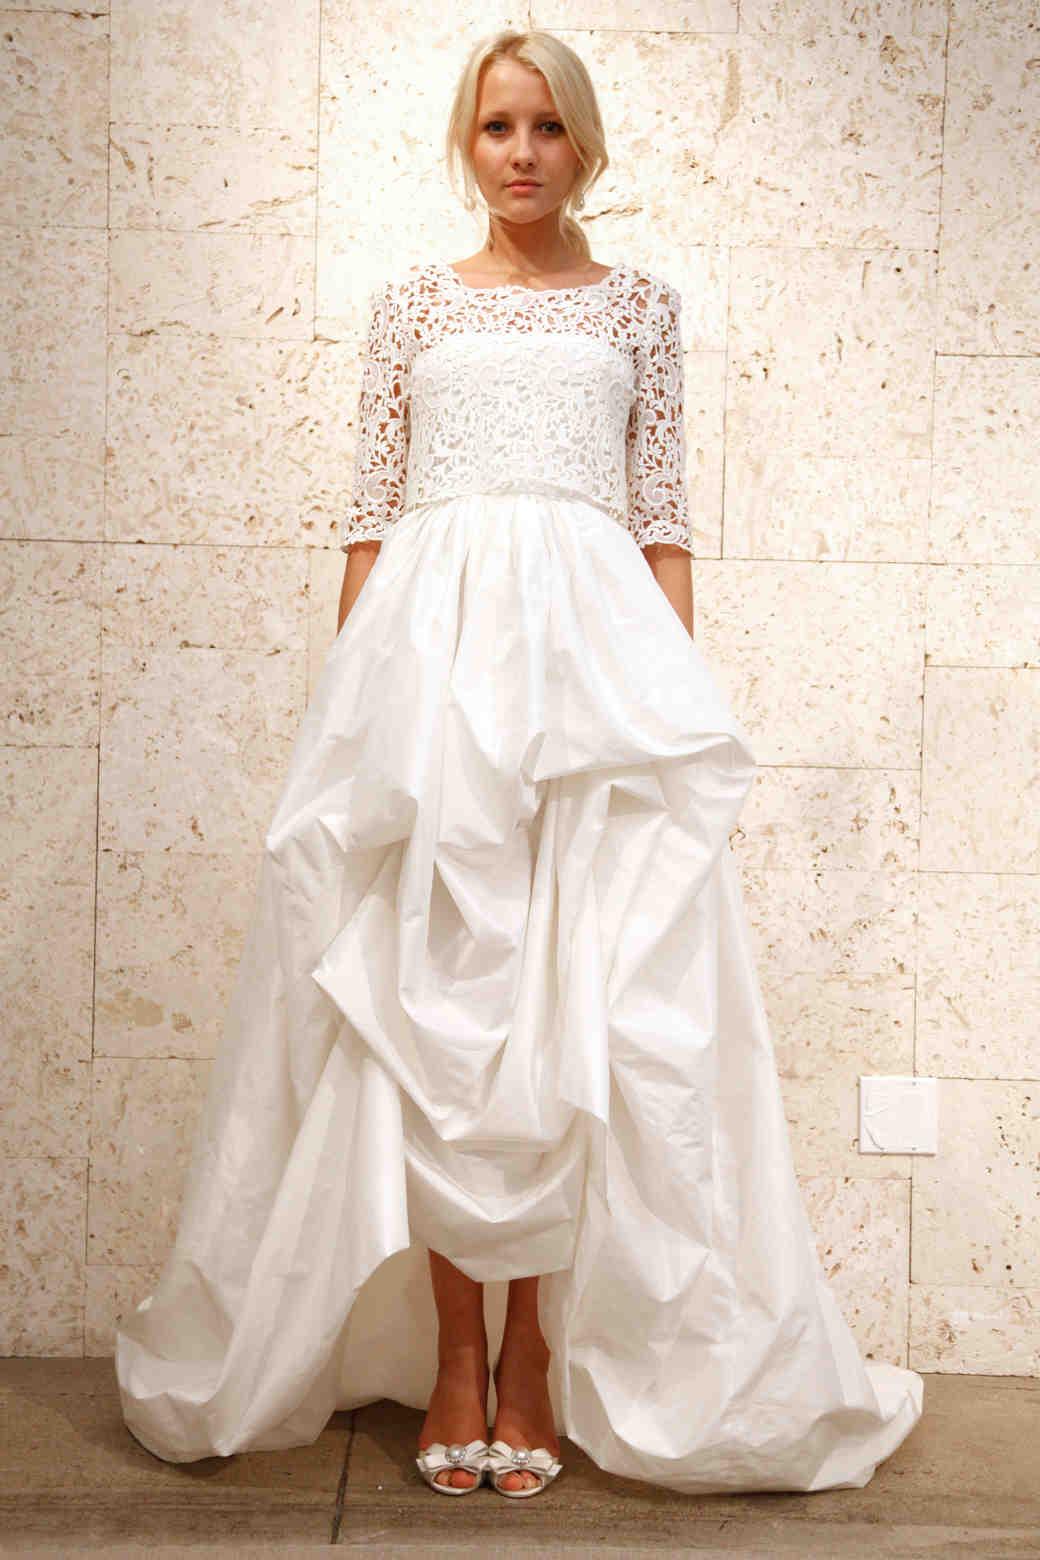 Oscar de la Renta, Fall 2012 Collection | Martha Stewart Weddings